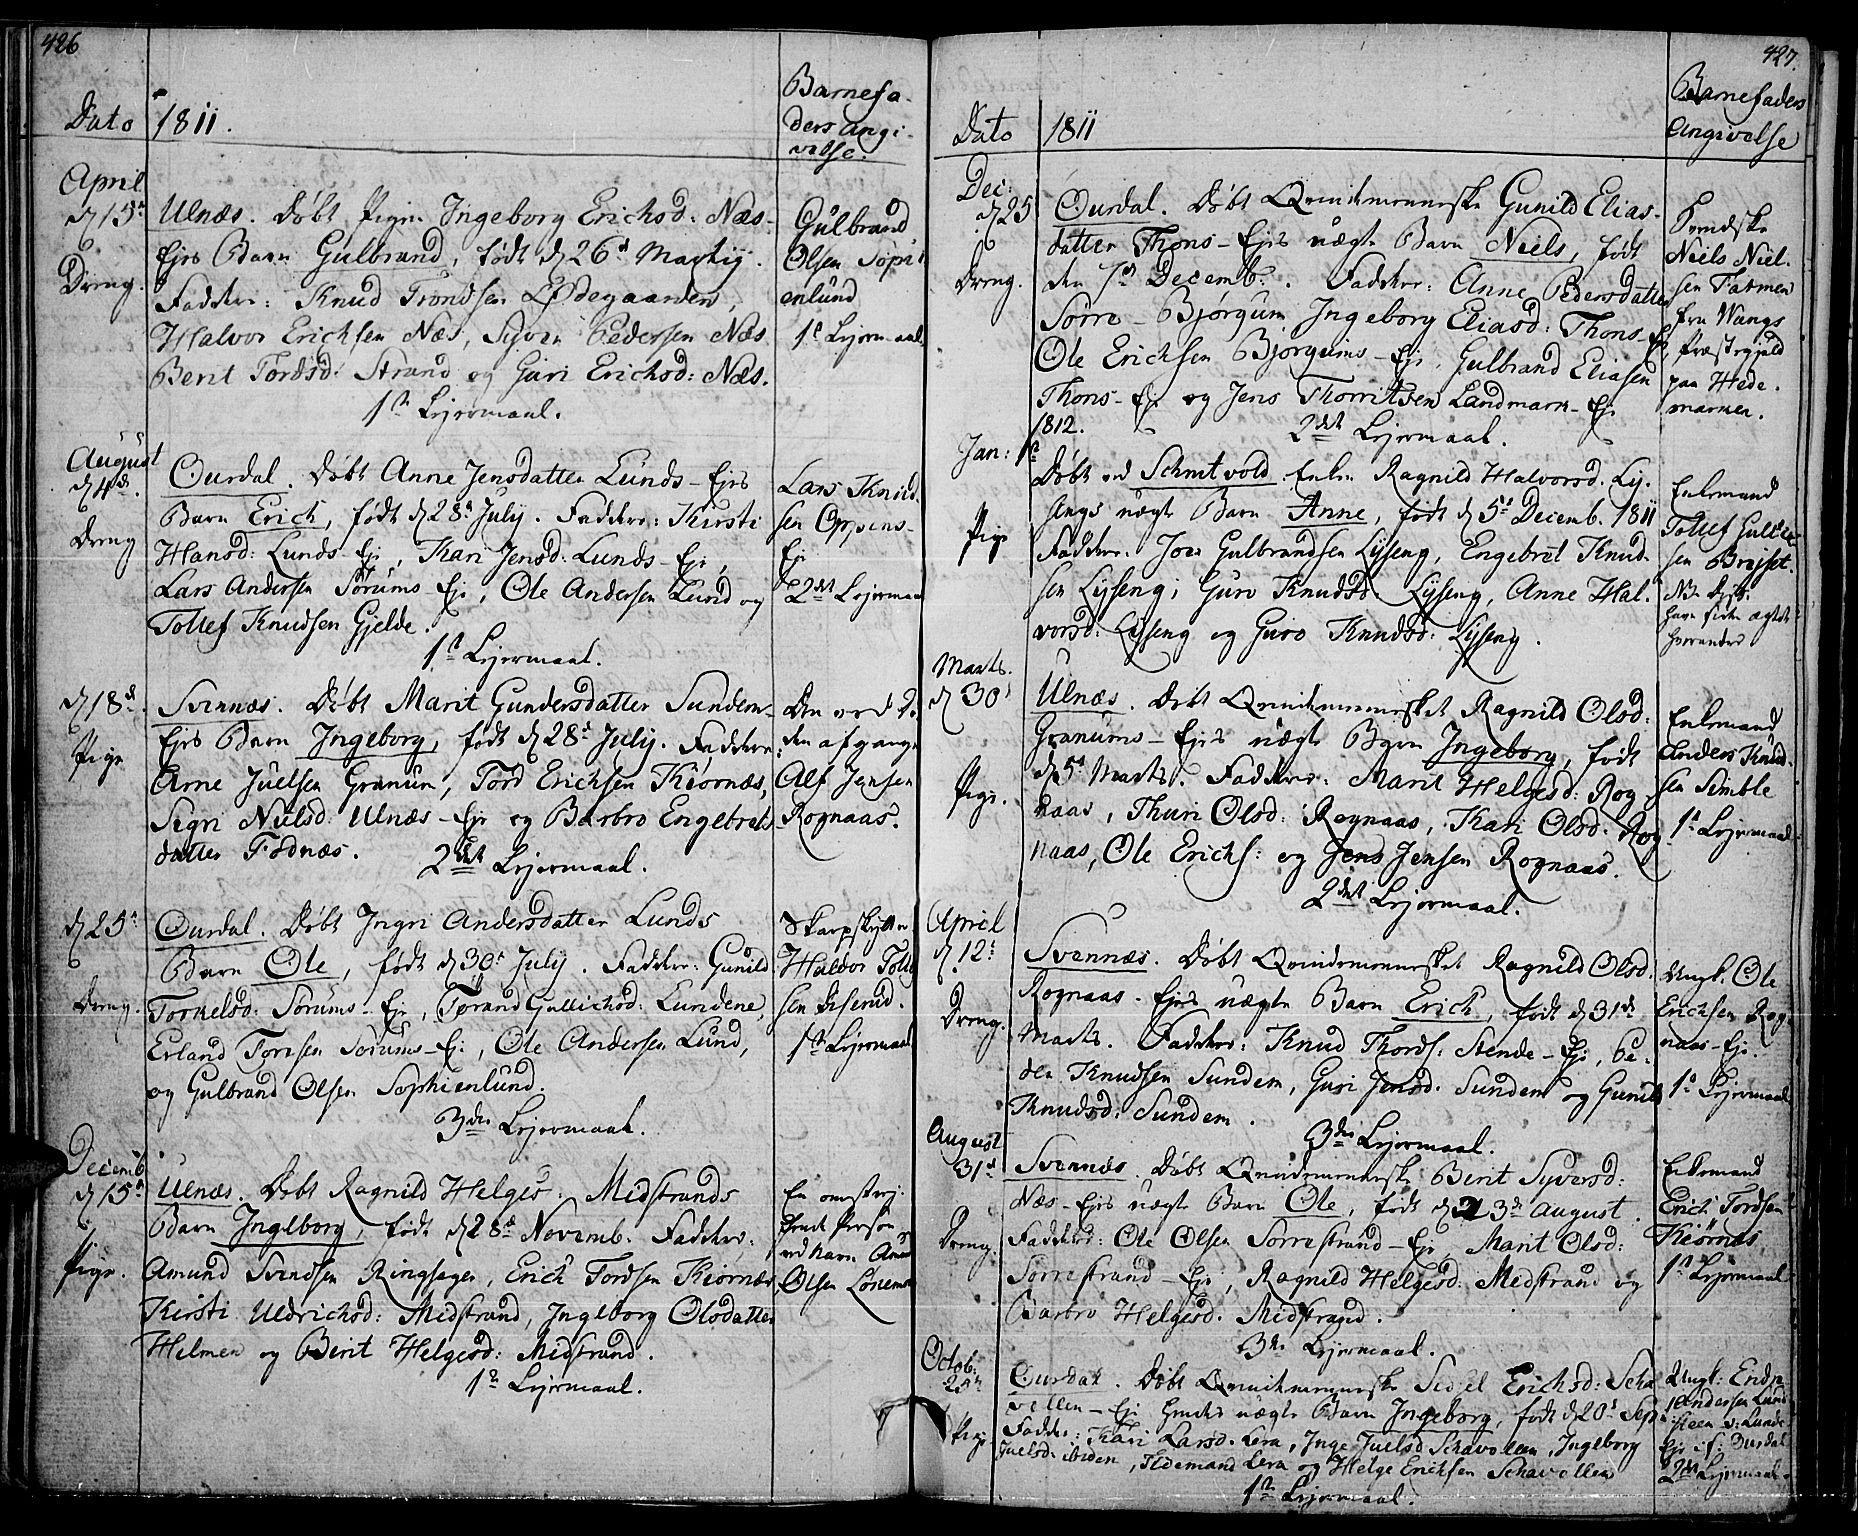 SAH, Nord-Aurdal prestekontor, Ministerialbok nr. 1, 1808-1815, s. 426-427